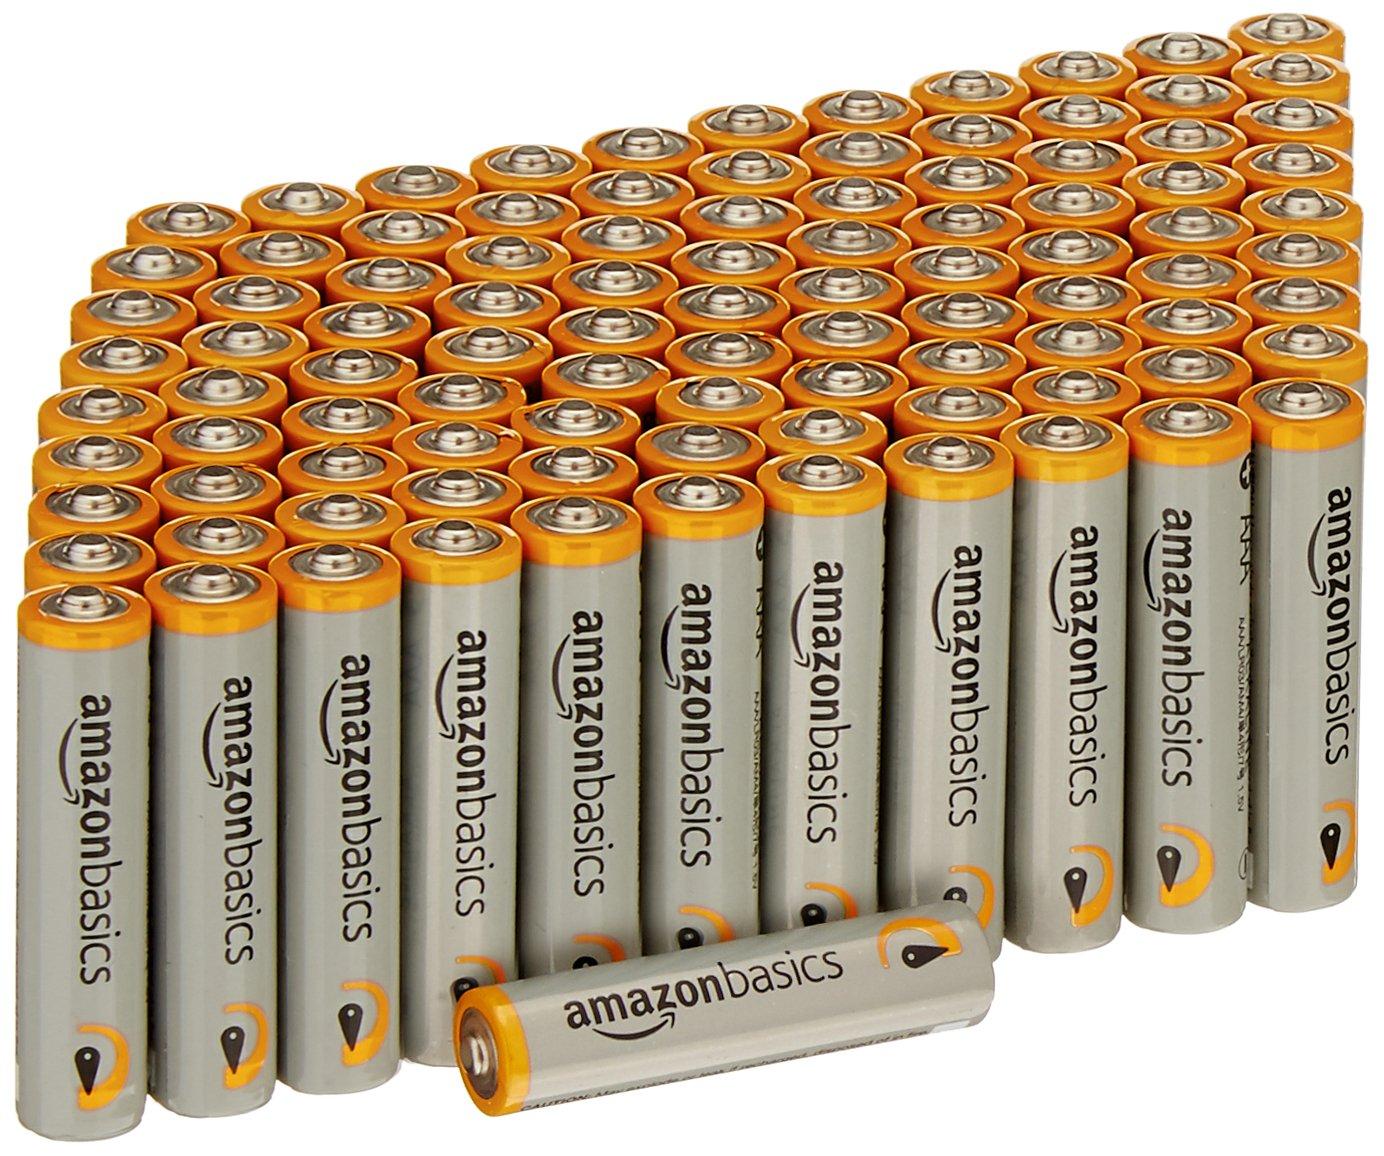 AmazonBasics AAA 1.5 Volt Performance Alkaline Batteries - Pack of 100 by AmazonBasics